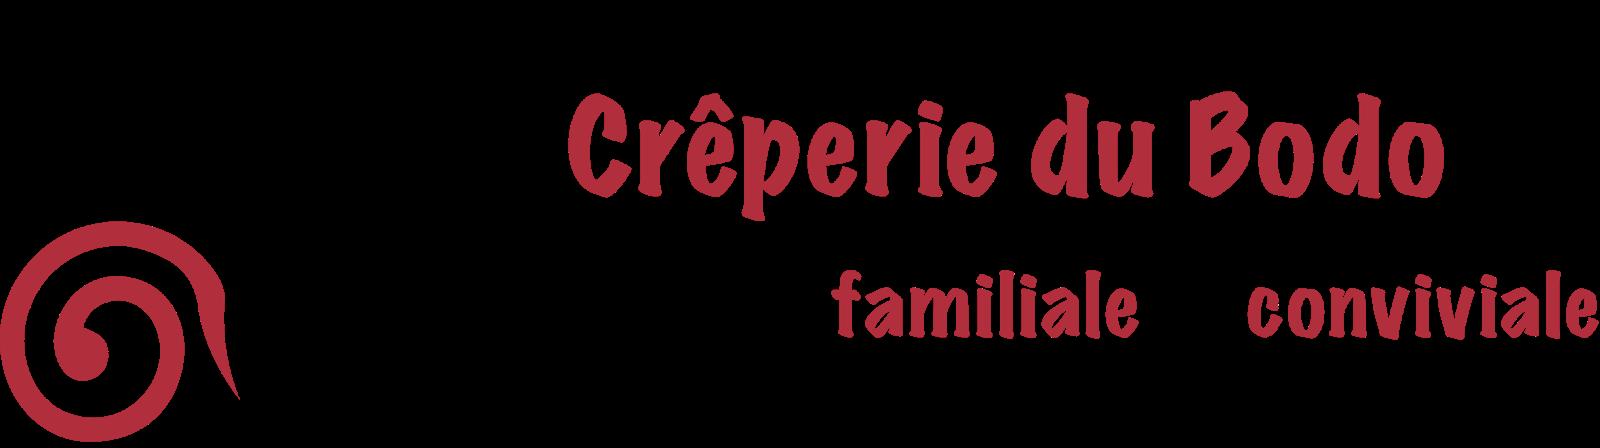 Crêperie du Bodo, crêperie conviviale et familiale